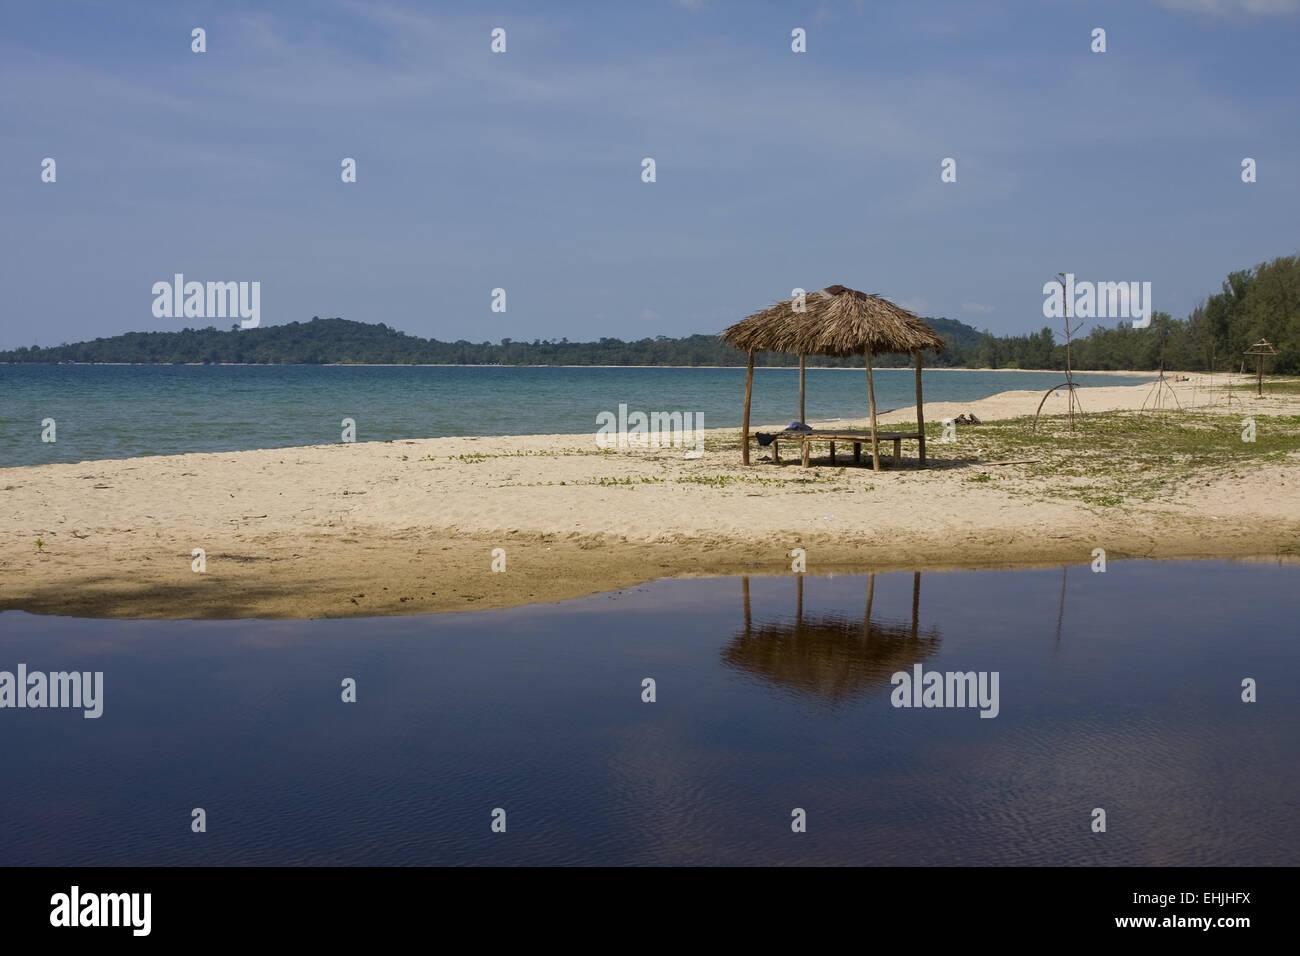 Cong,Cau-Resort,near,Mui,Ne ,,Vietnam,Asia Stock Photo